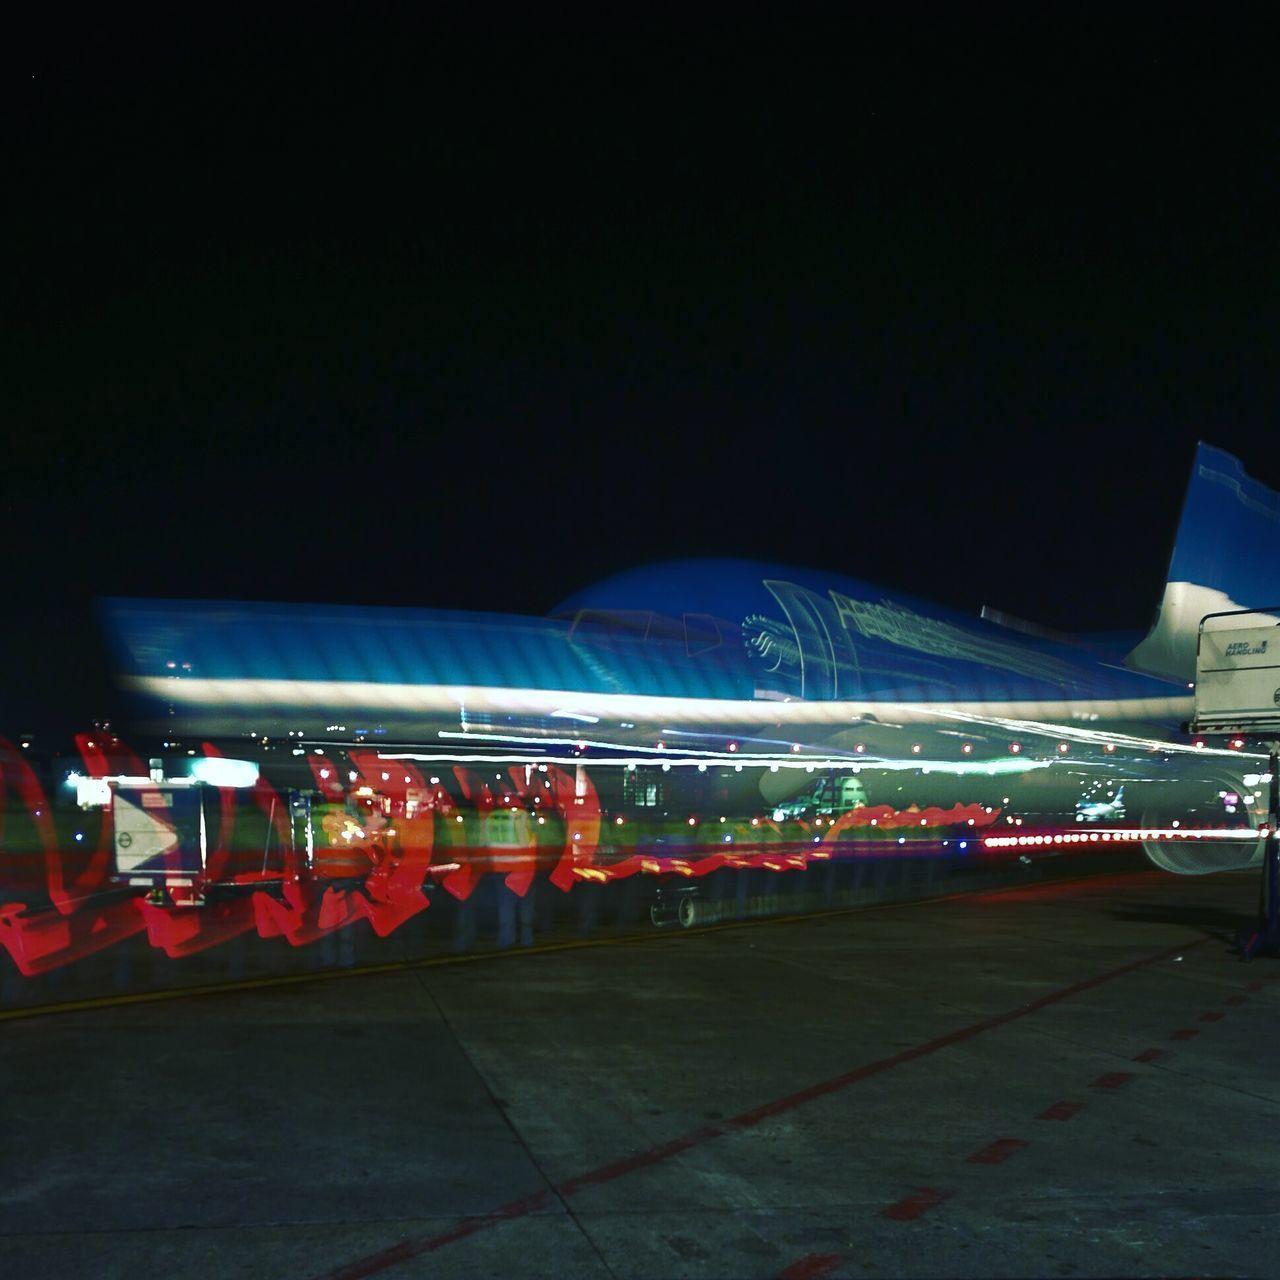 Night Illuminated Outdoors Art In Movement Marshaling Conections Sky Multiple Image Aviation